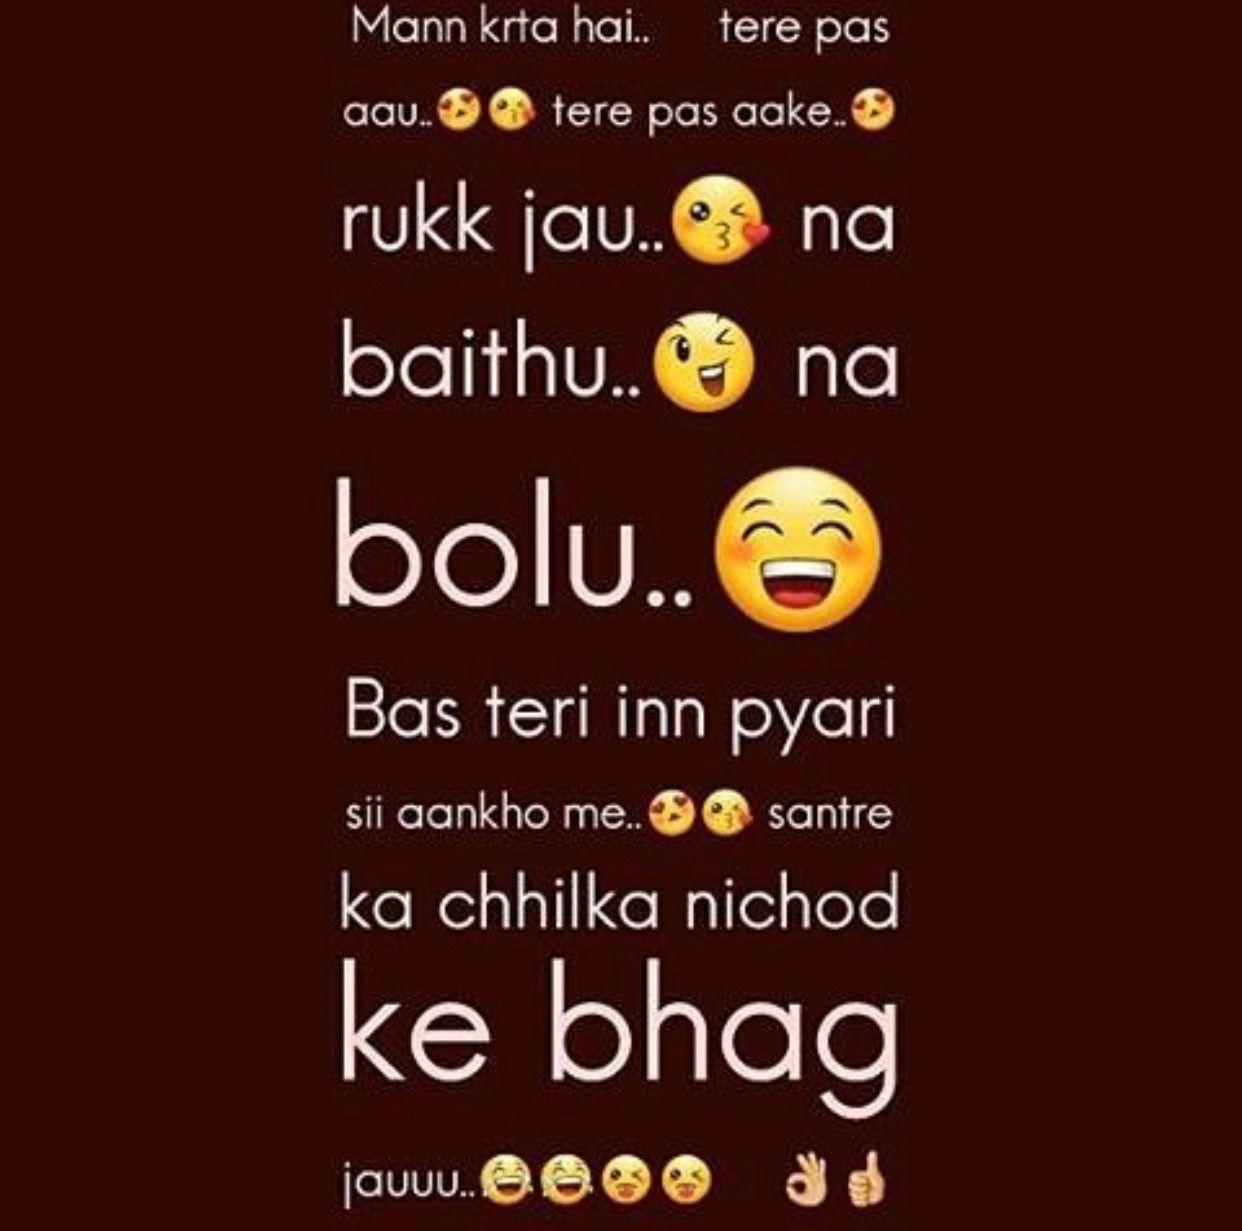 Pin By Laila Hussain On Desi Jokes & Humor